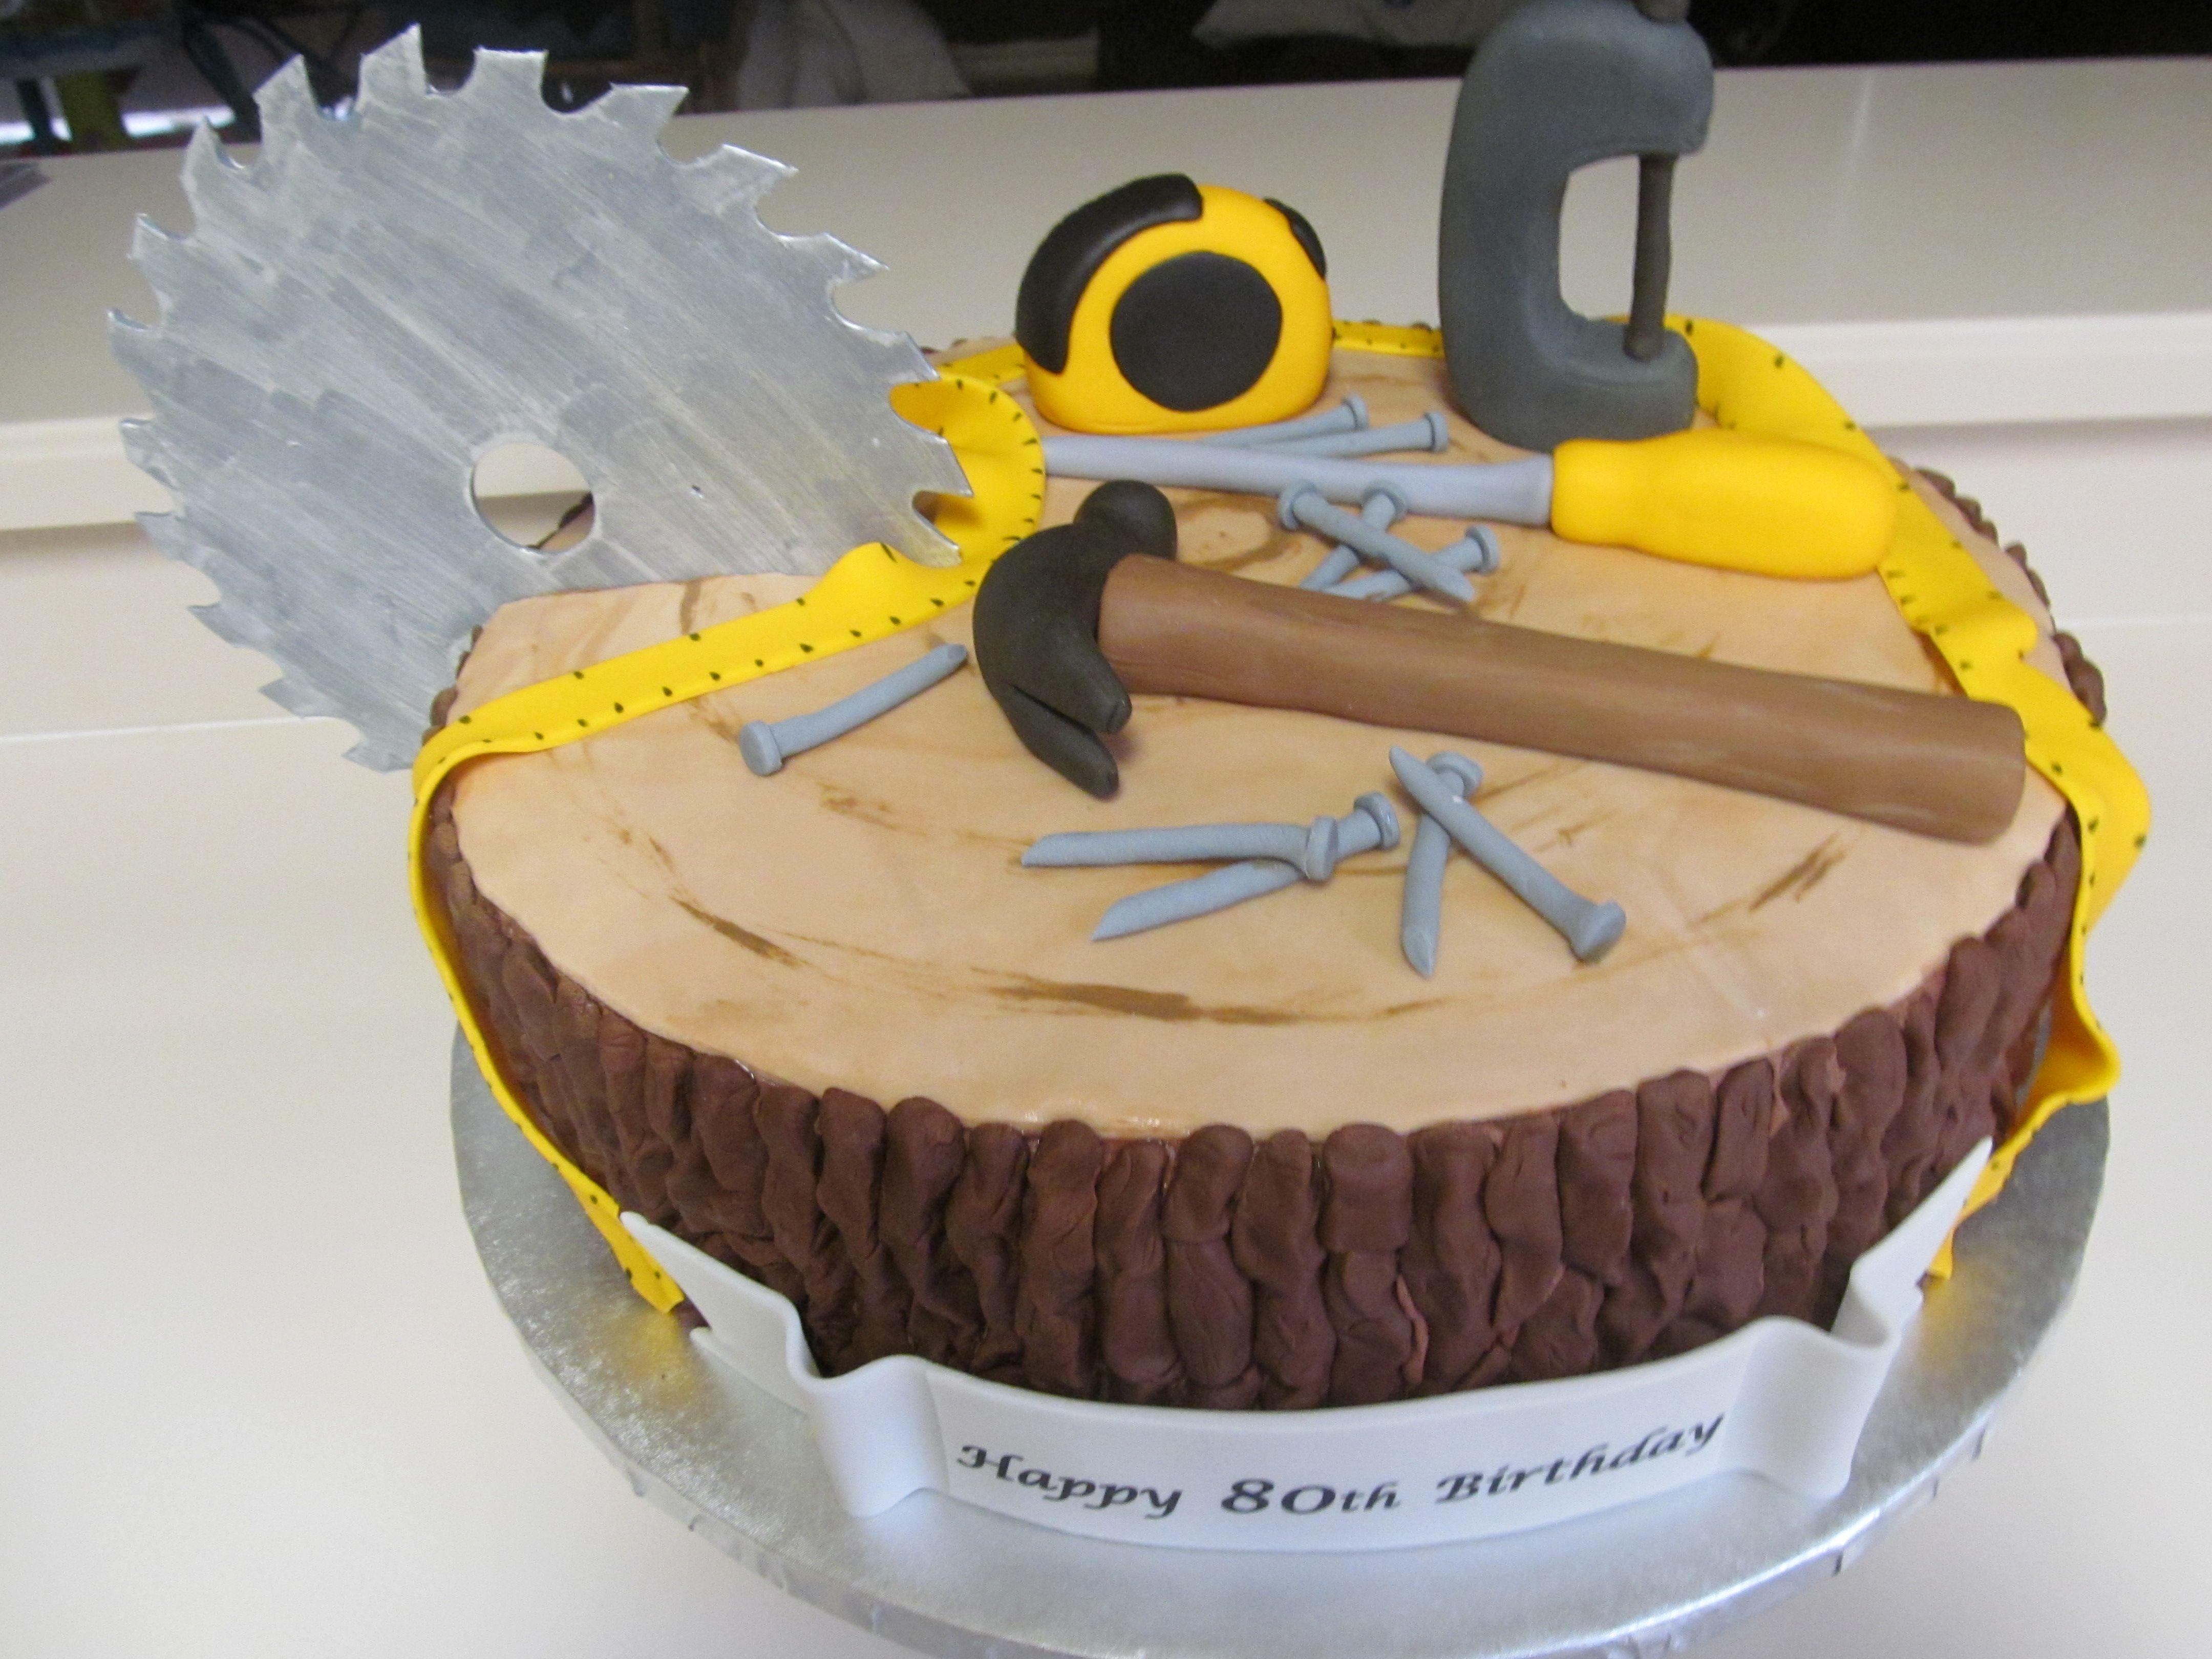 80th Birthday Cake - Wood Worker